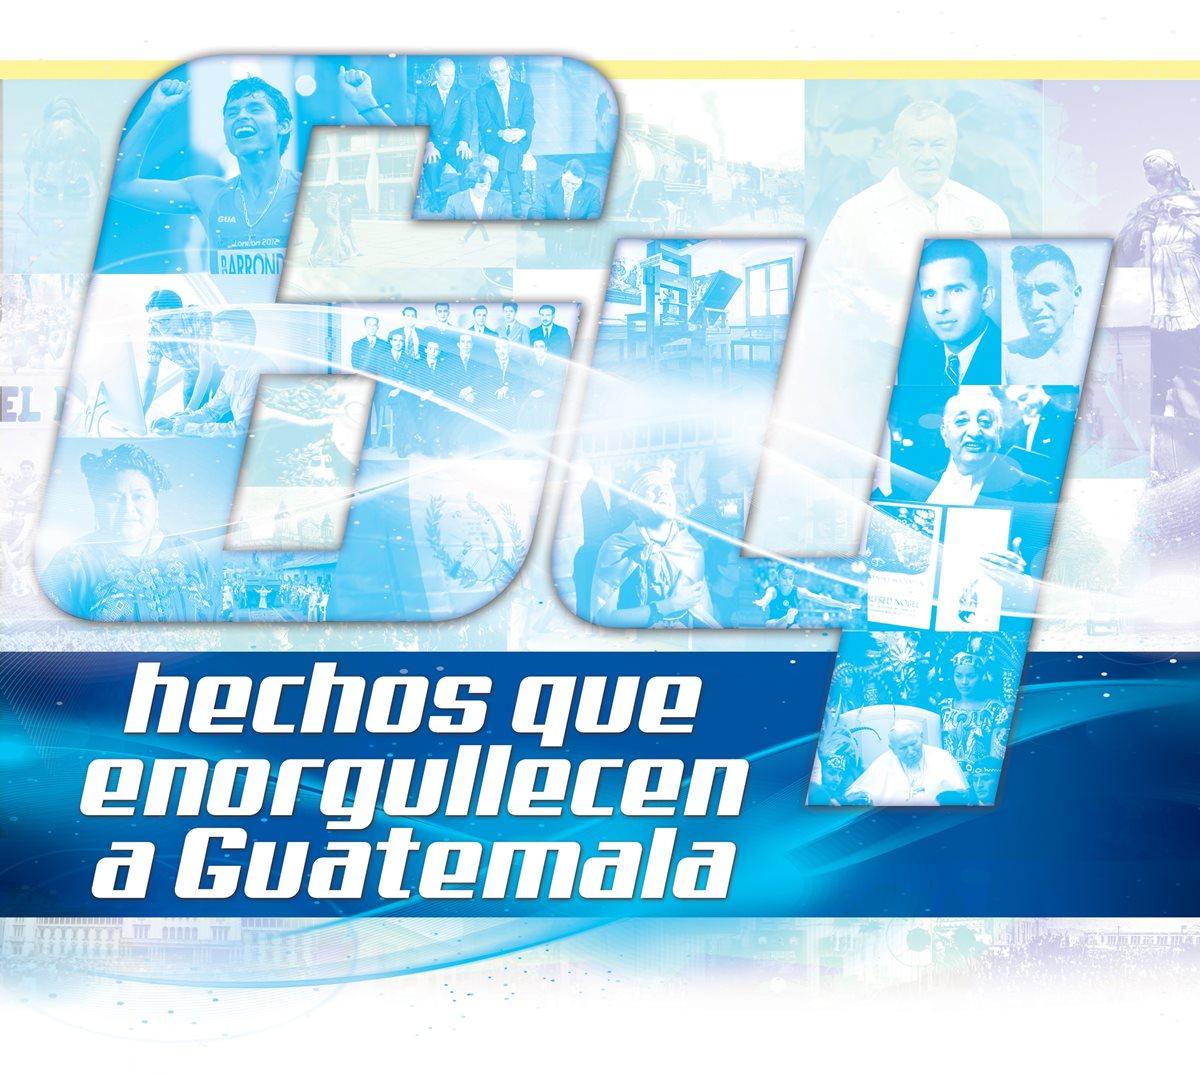 64 hechos que enorgullecen a Guatemala